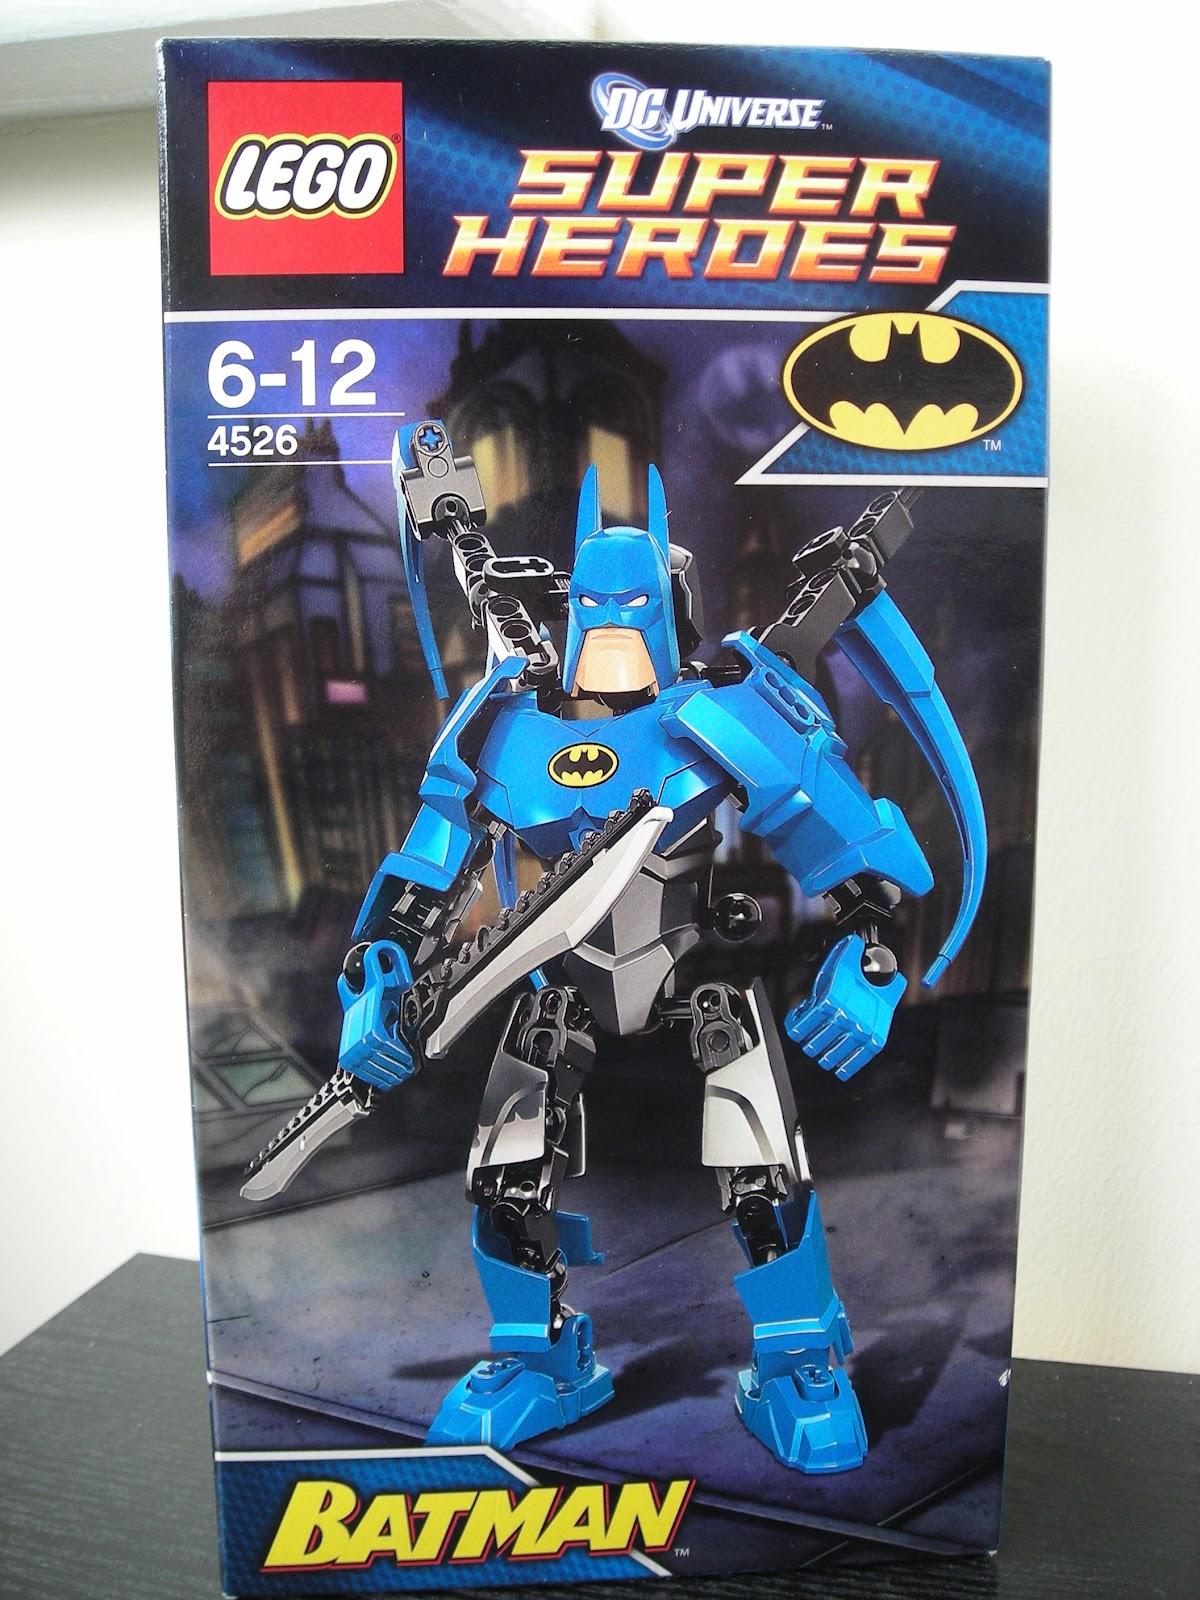 Lego Batman Toys : Toys super hero the toybox lego dc universe